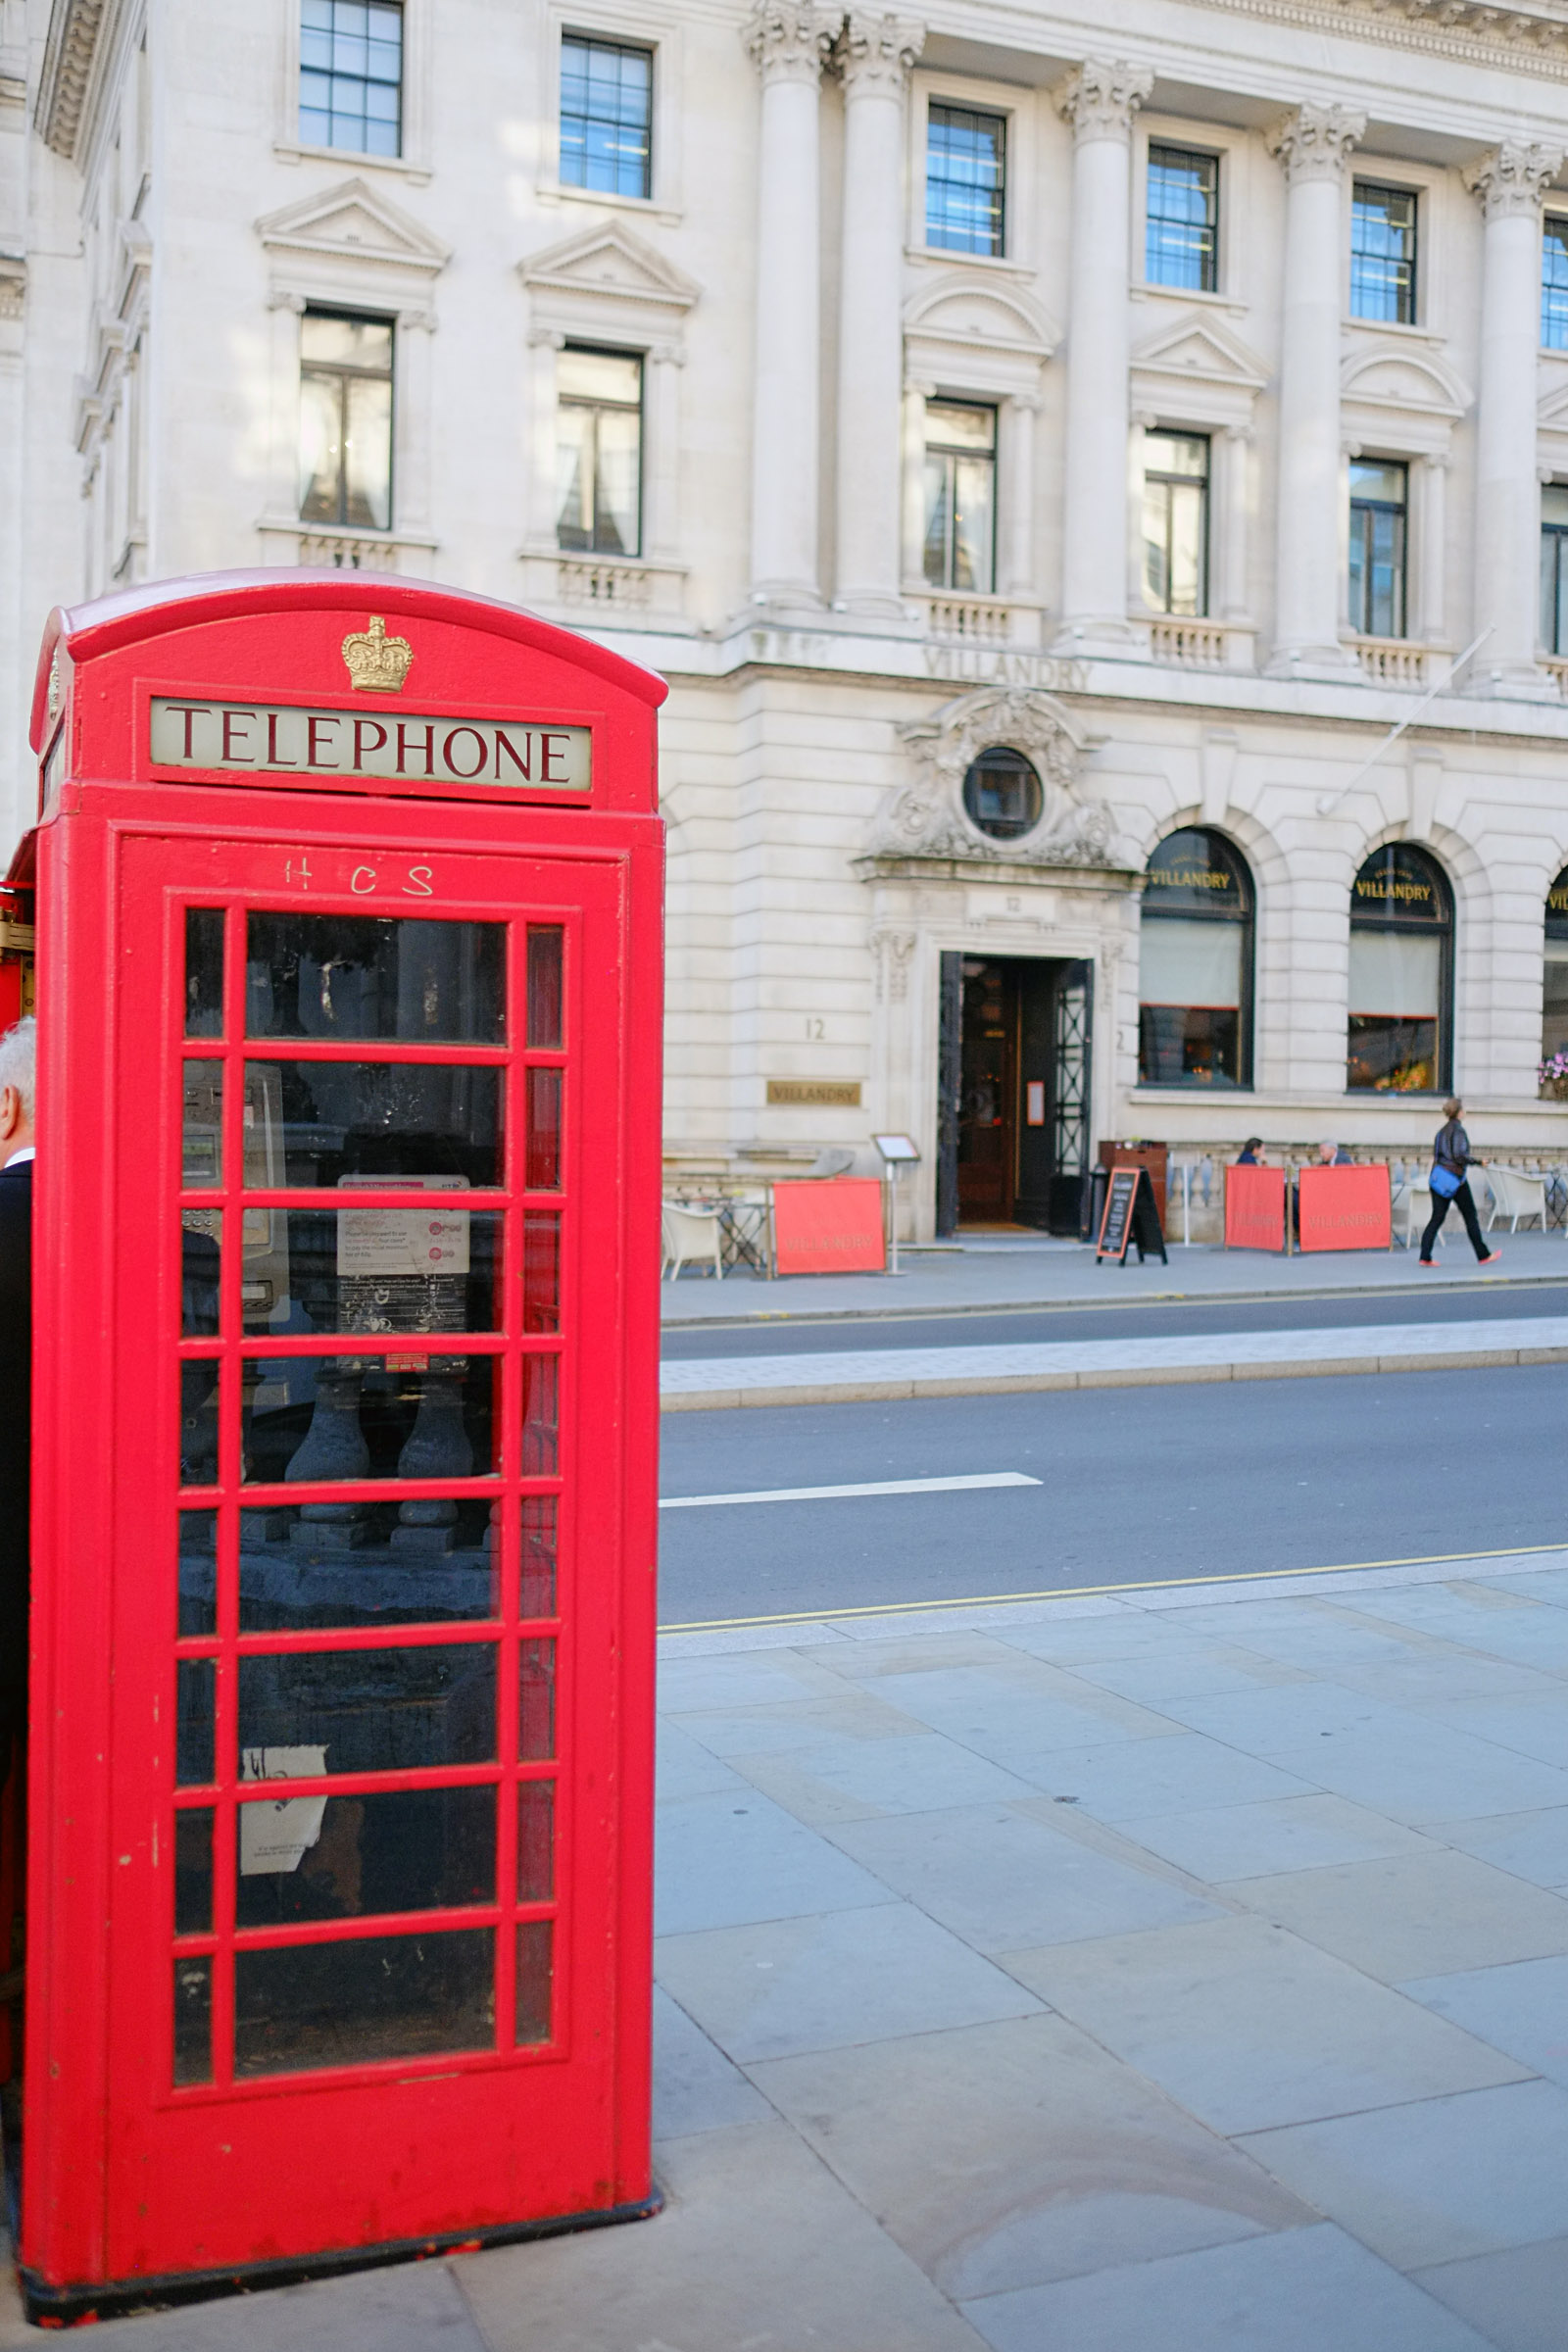 London: A family vacation